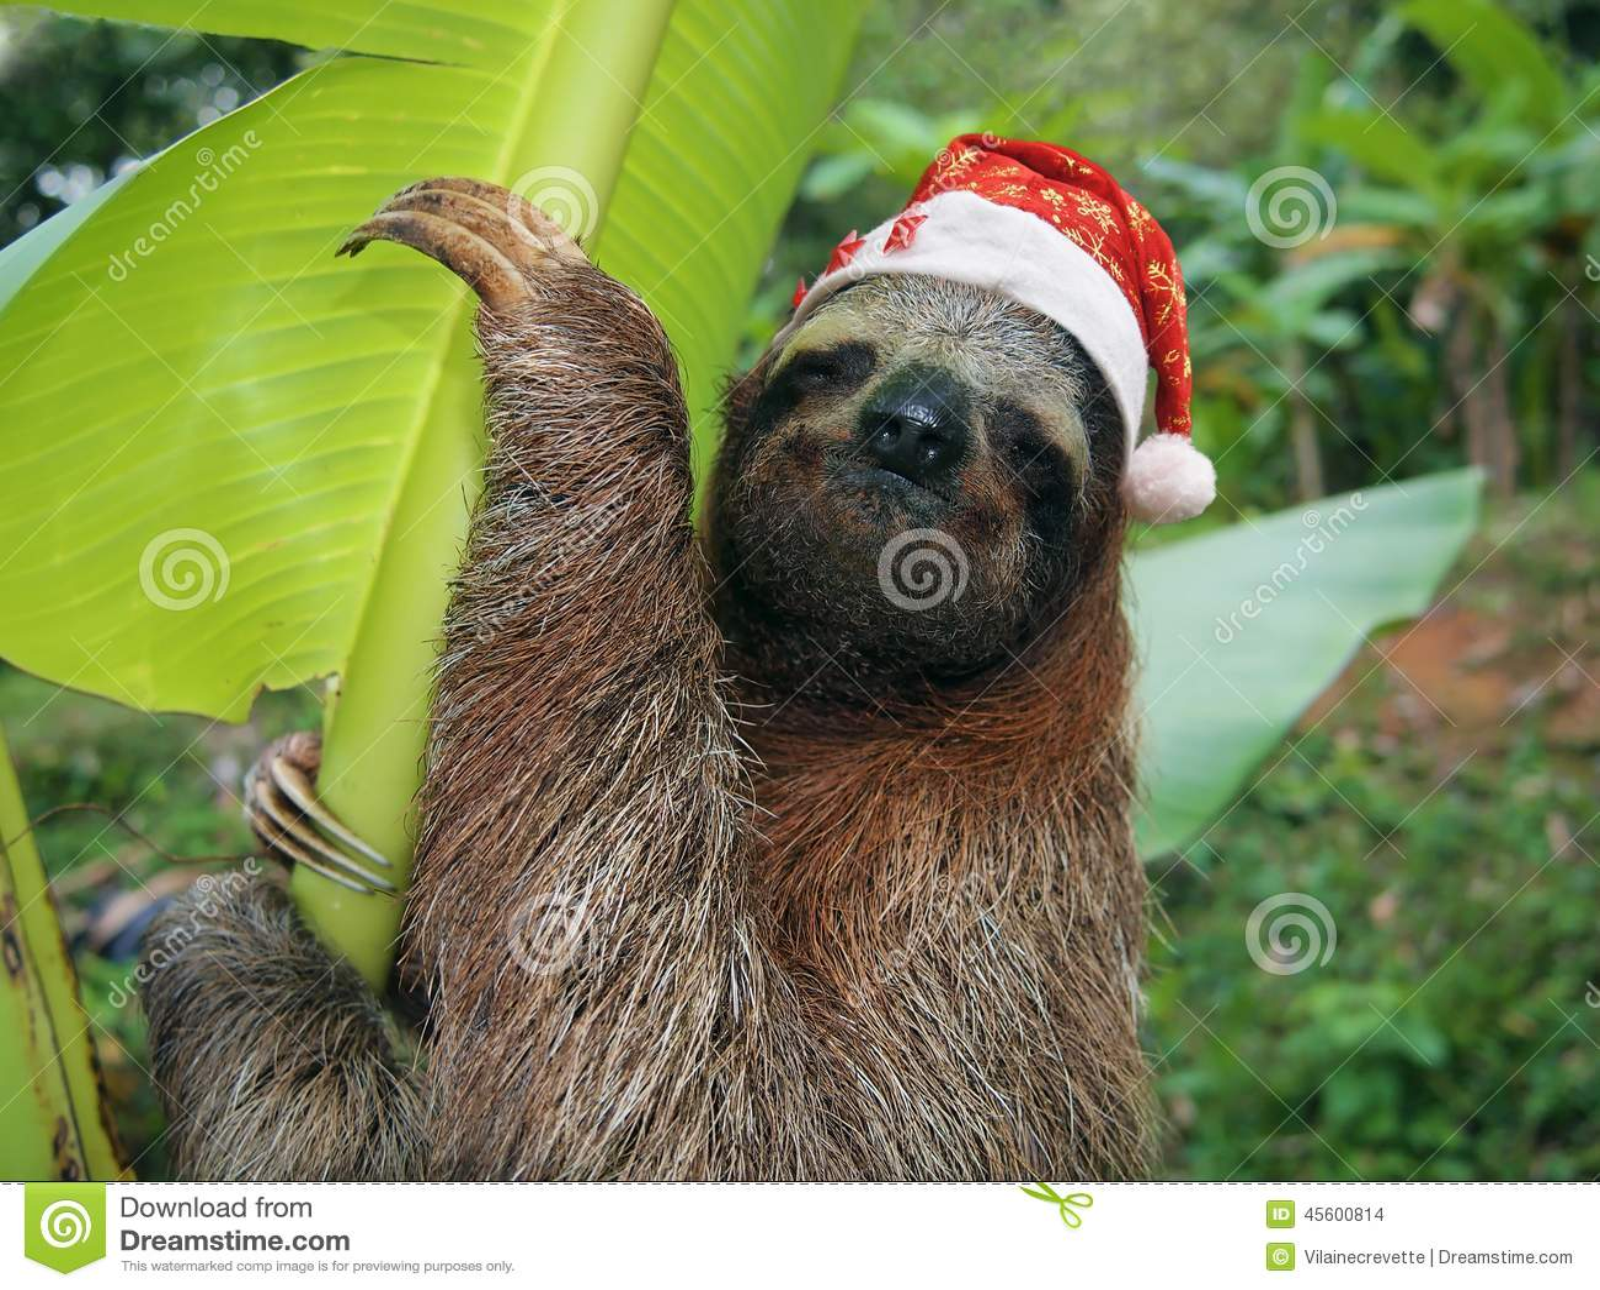 Christmas Animal Sloth Wearing A Santa Hat Stock Photo - Image ...